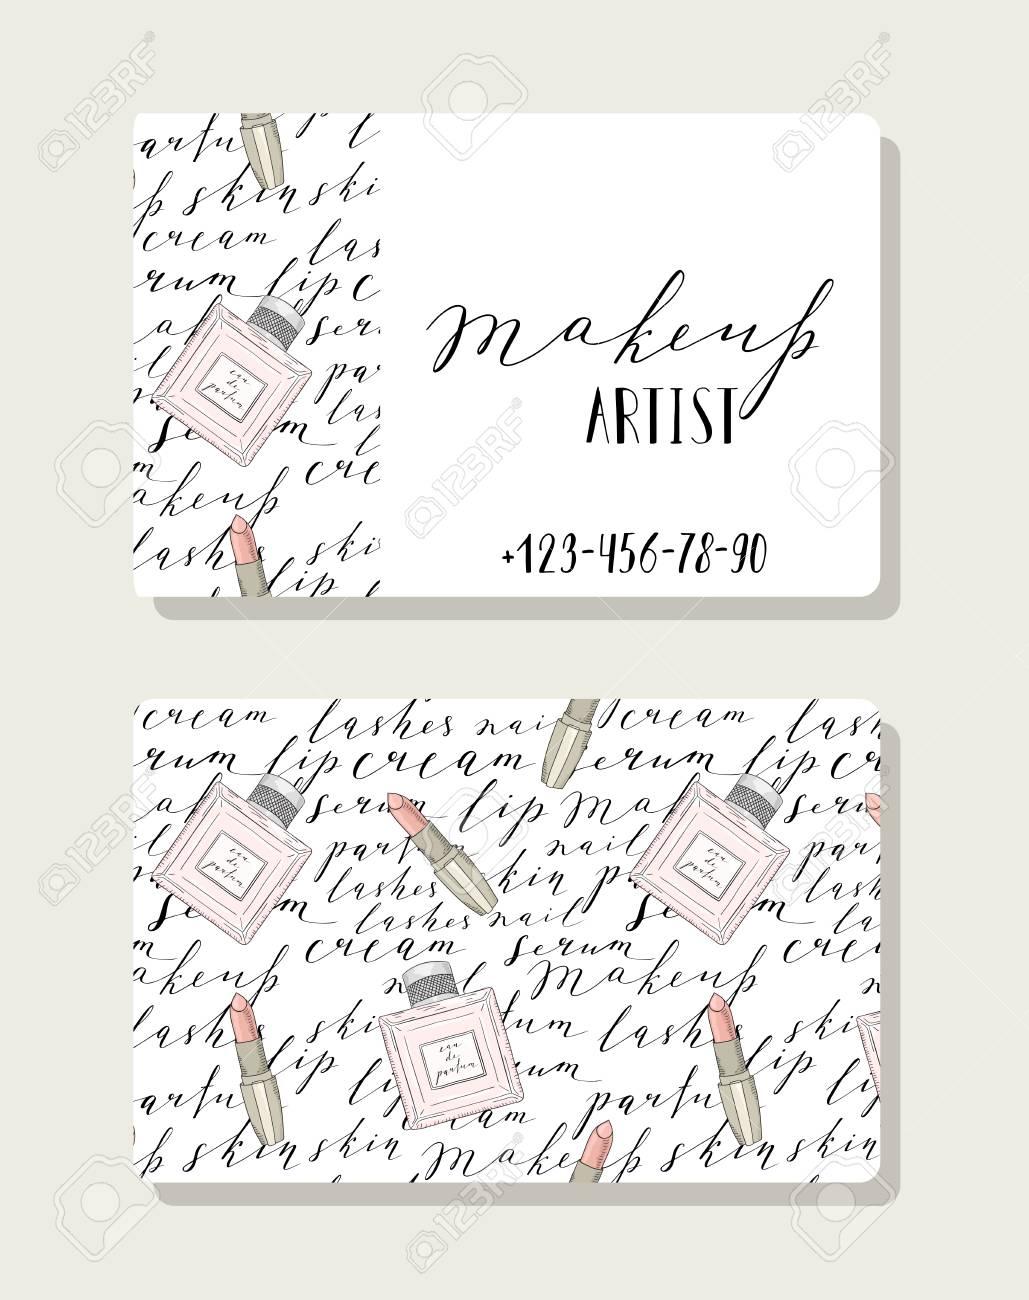 Business Card For Makeup Artist, Pattern With Handwritten Words ...